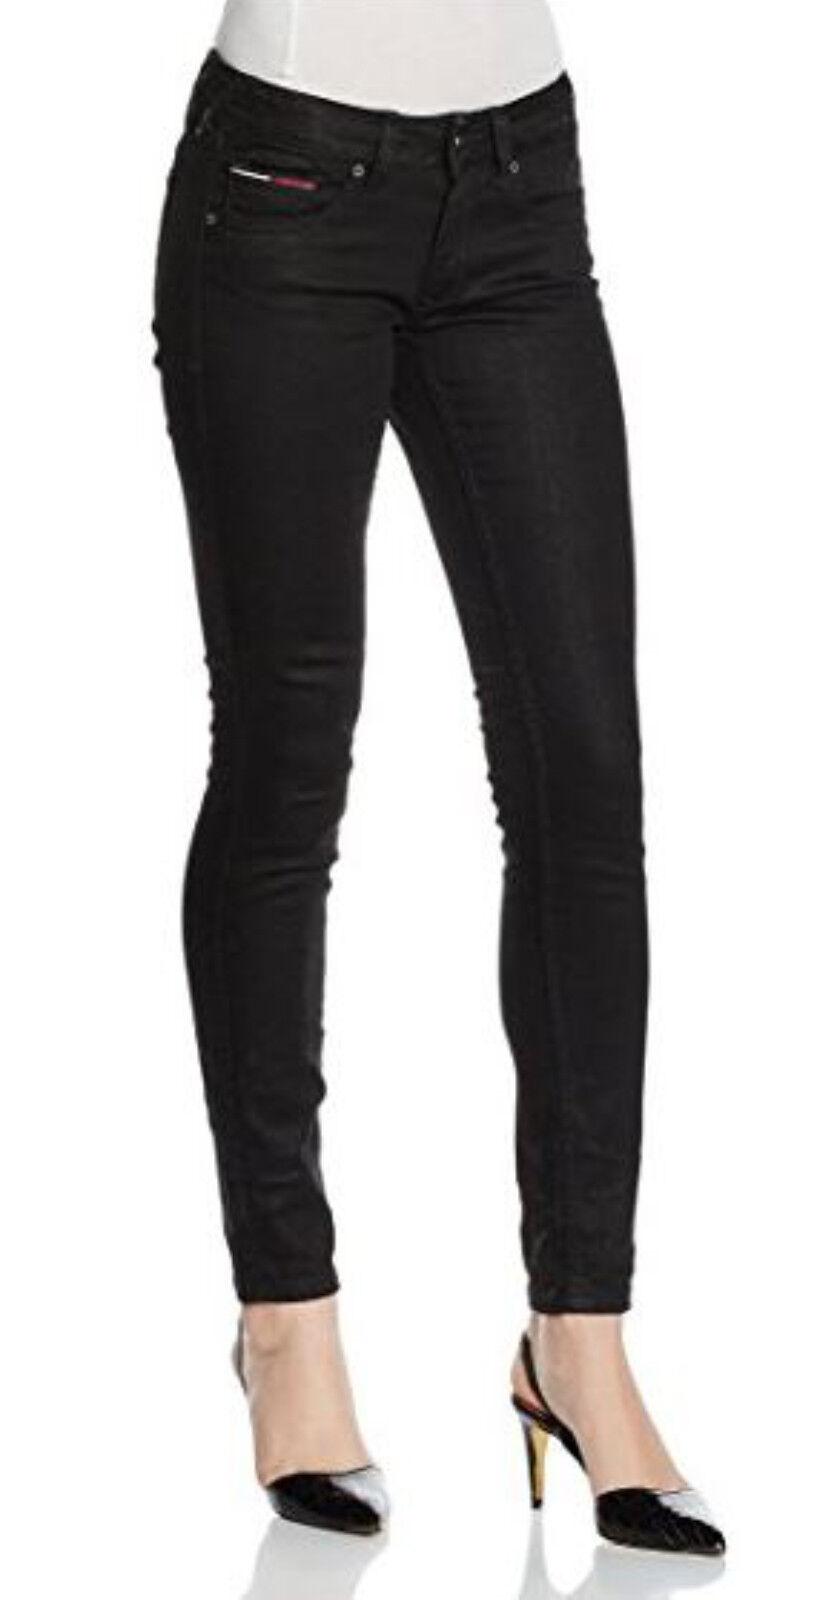 Hilfiger Denim women's coated skinny leg, mid rise jeans size W25xL32